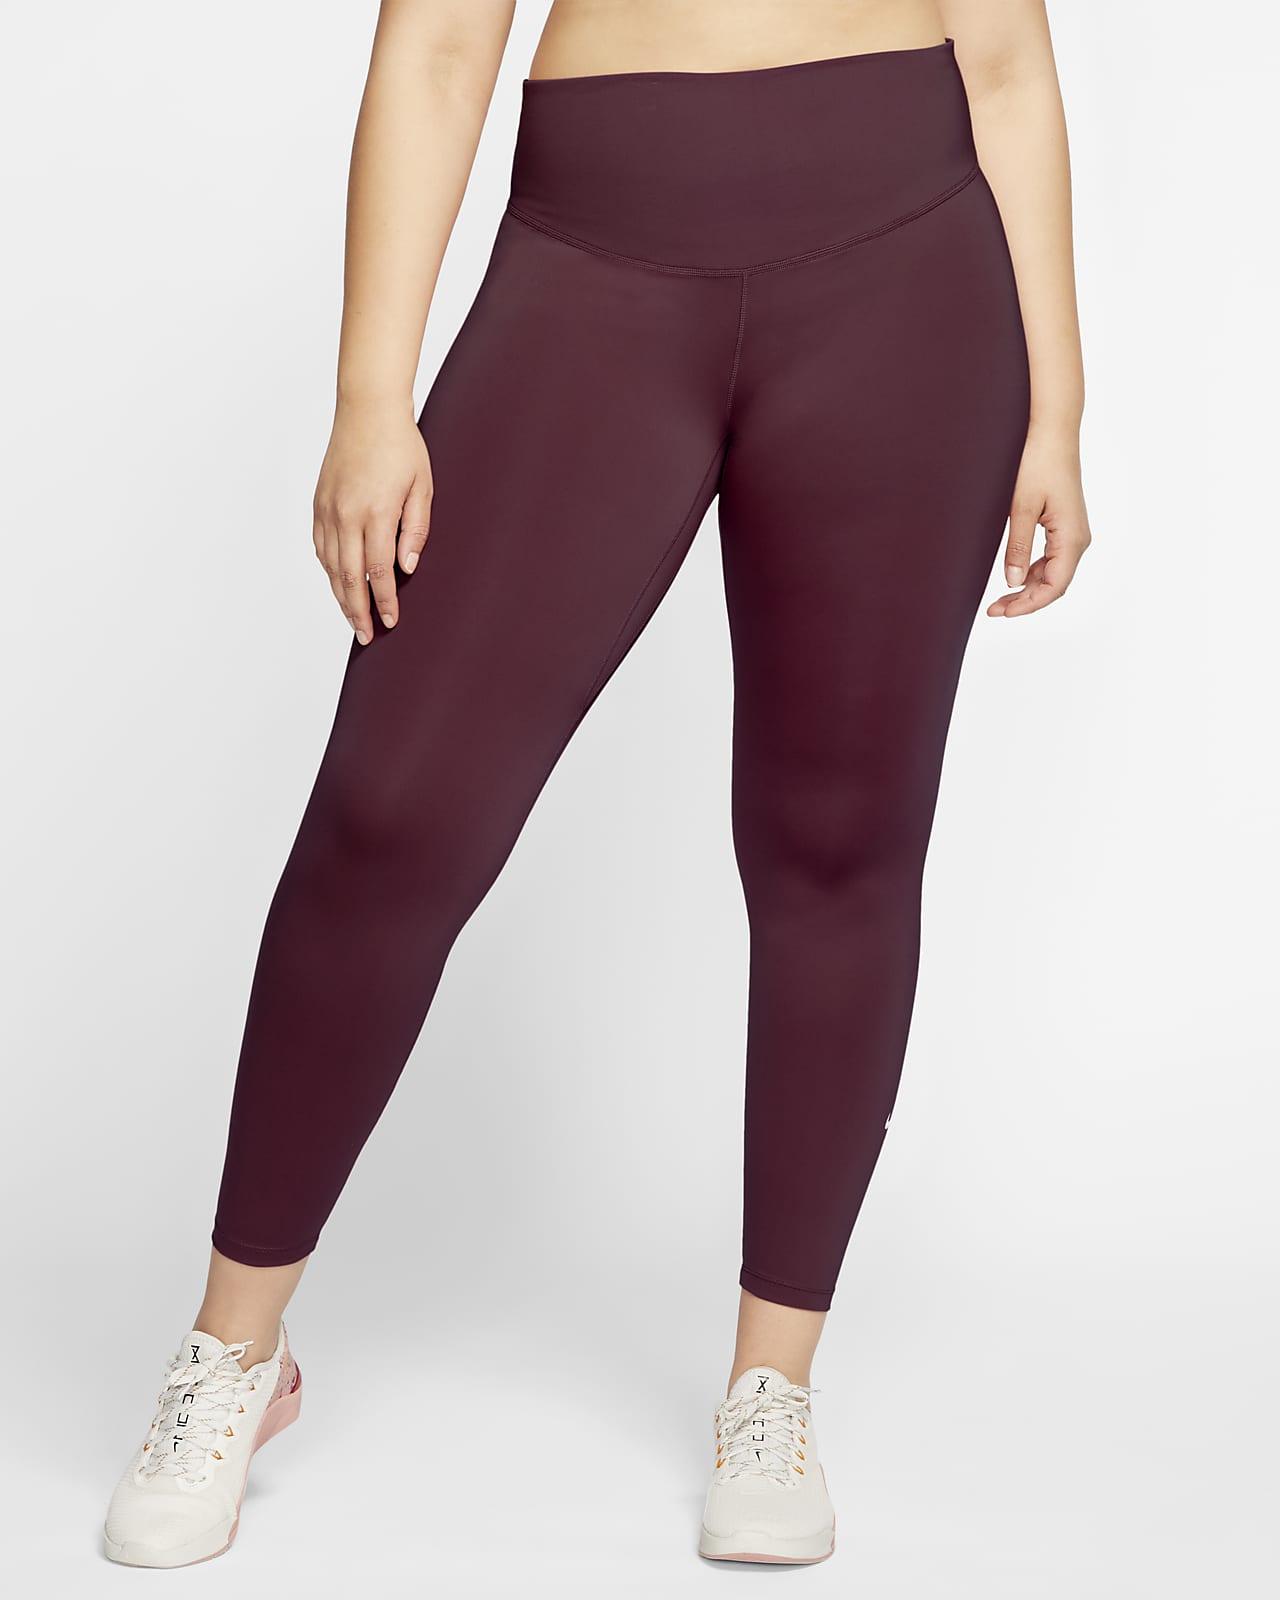 Nike One Damen-Leggings (große Größe)